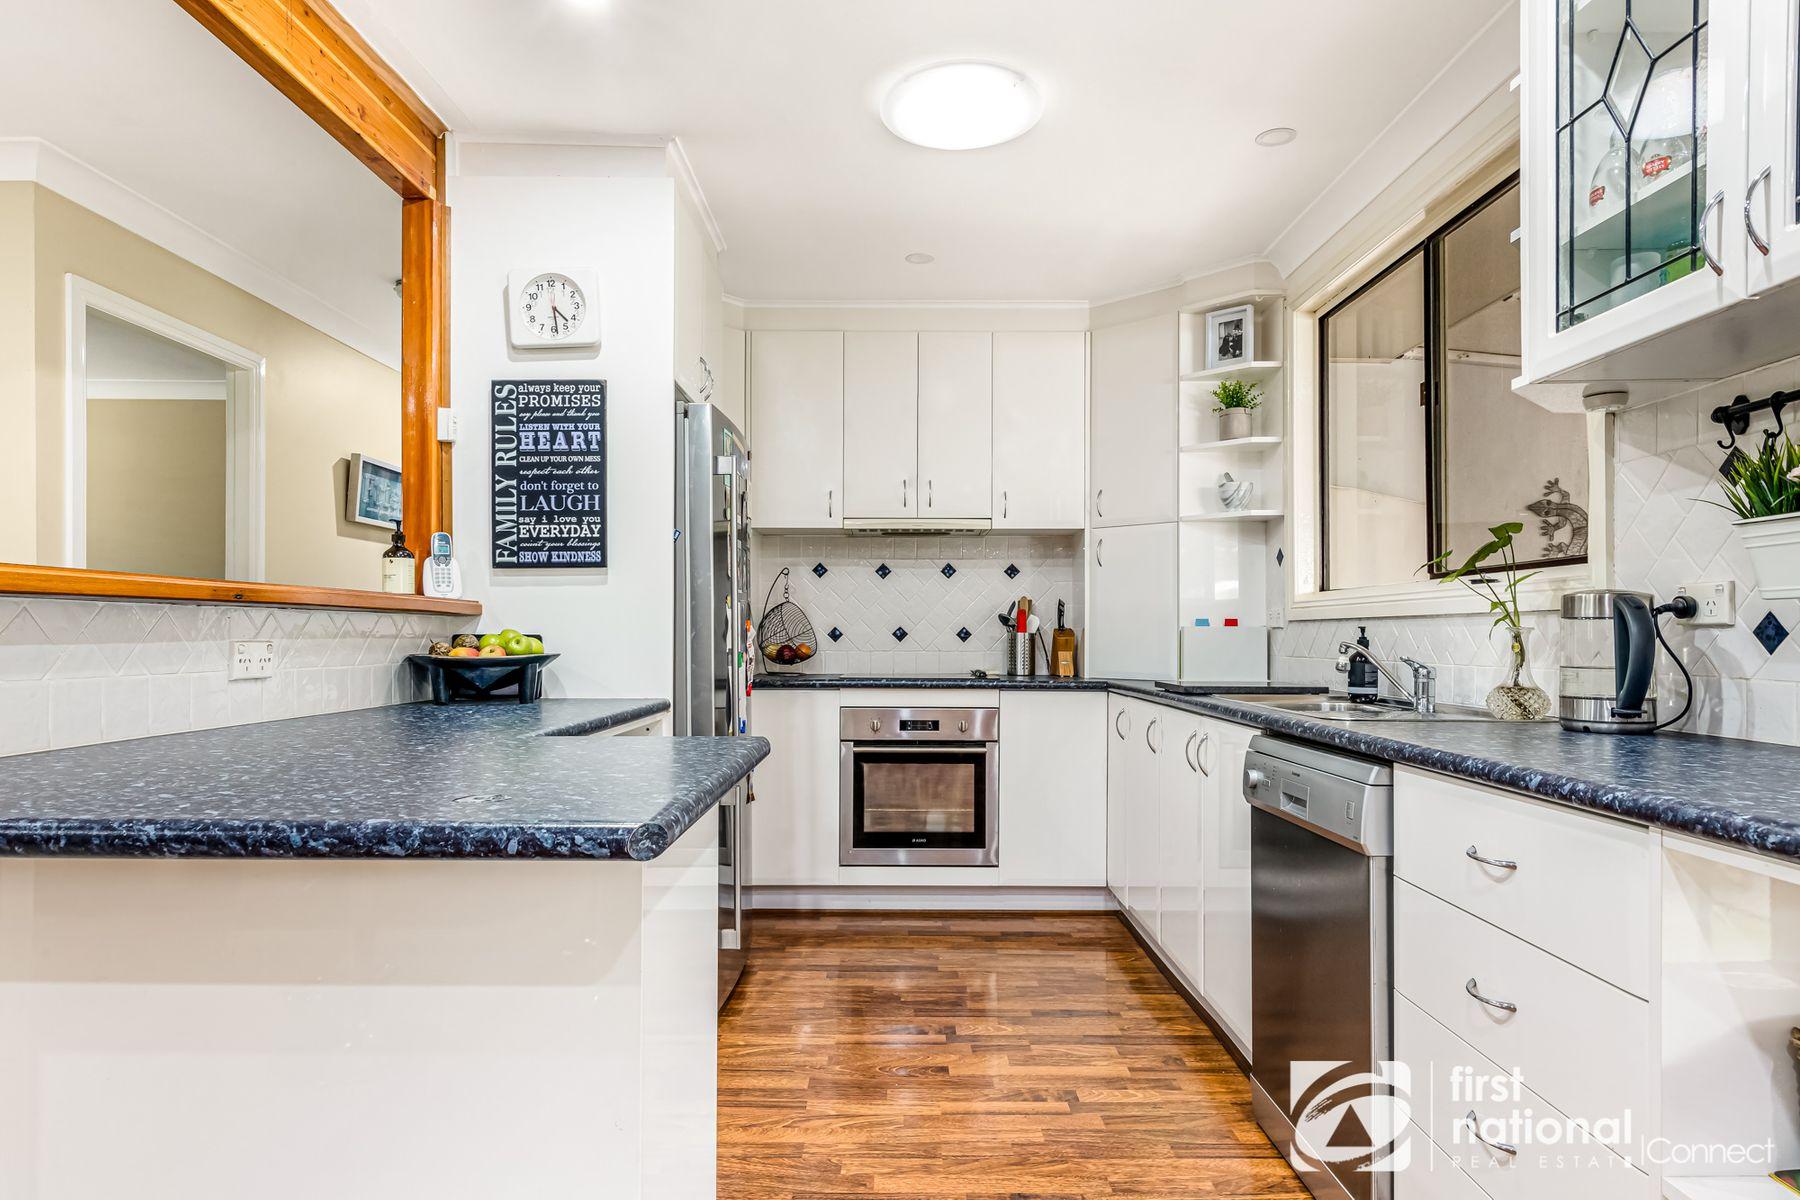 111 Shepherds Rd, Freemans Reach, NSW 2756